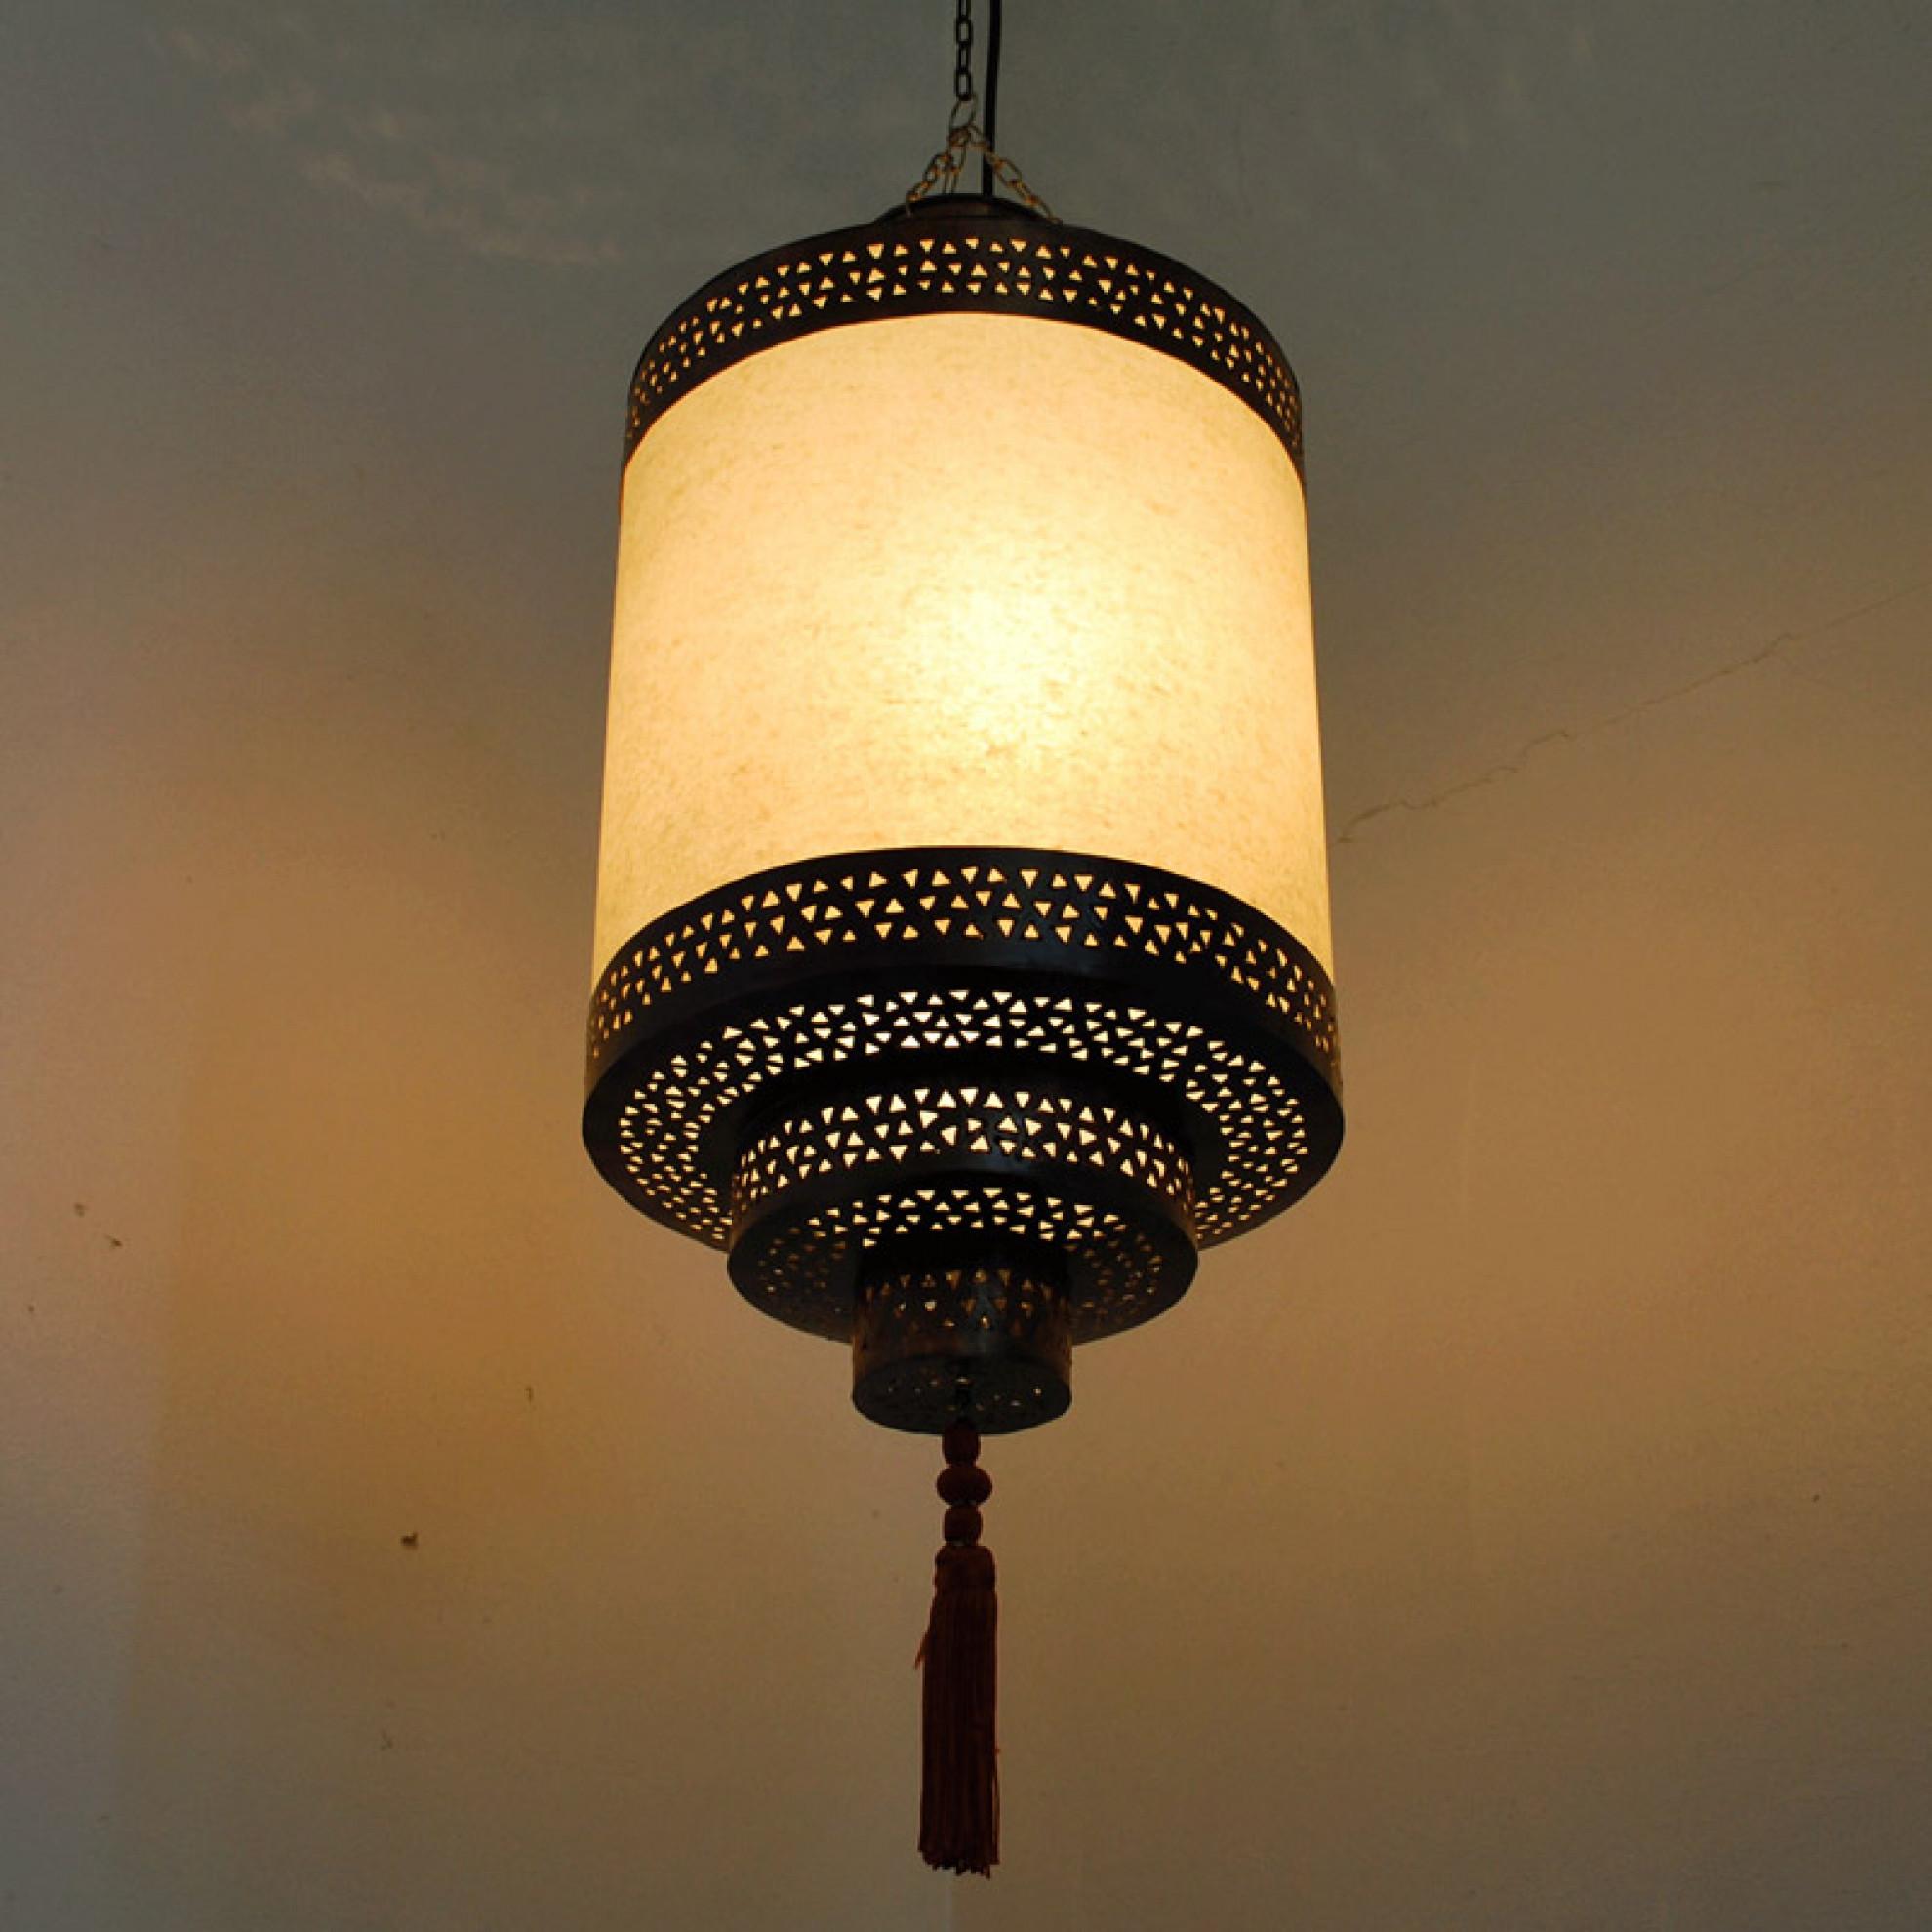 arabische lampe koutoubia orange 120cm smash. Black Bedroom Furniture Sets. Home Design Ideas